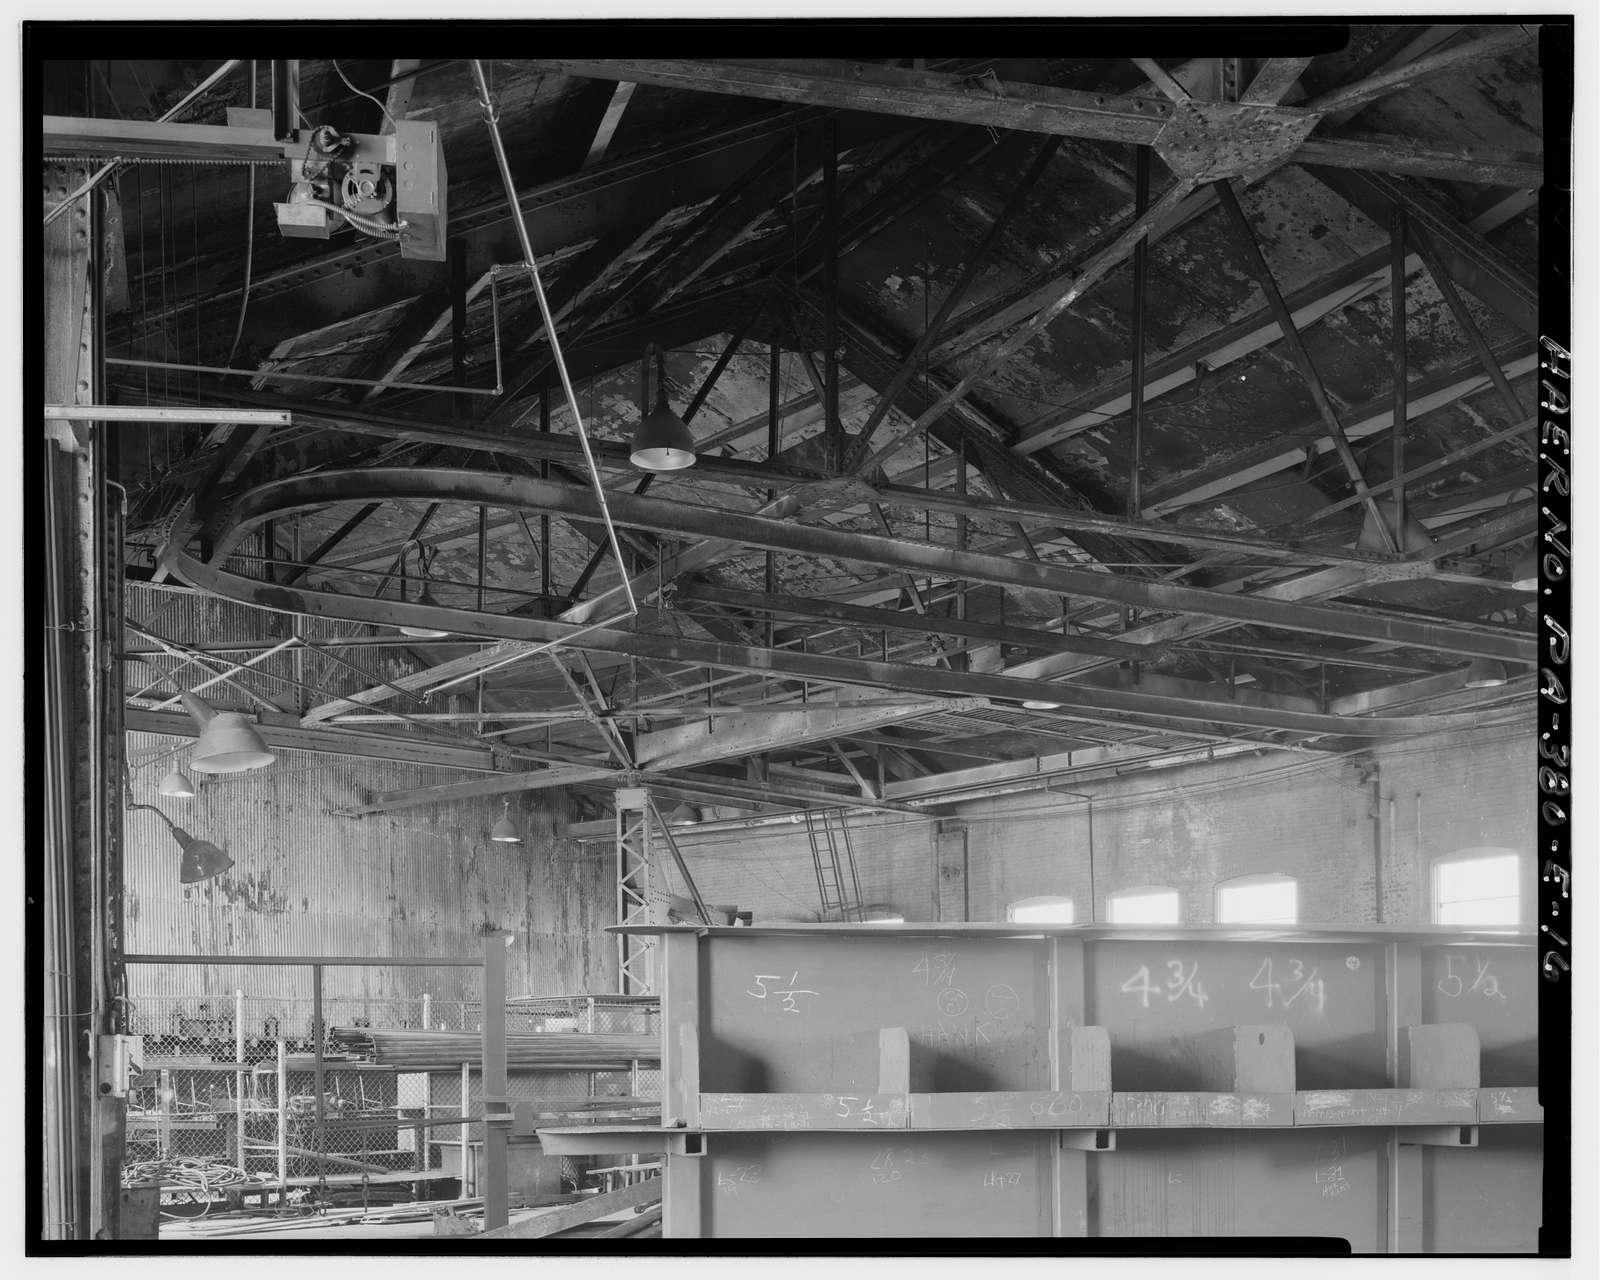 U.S. Steel National Tube Works, Auxiliary Buildings, Along Monongahela River, McKeesport, Allegheny County, PA